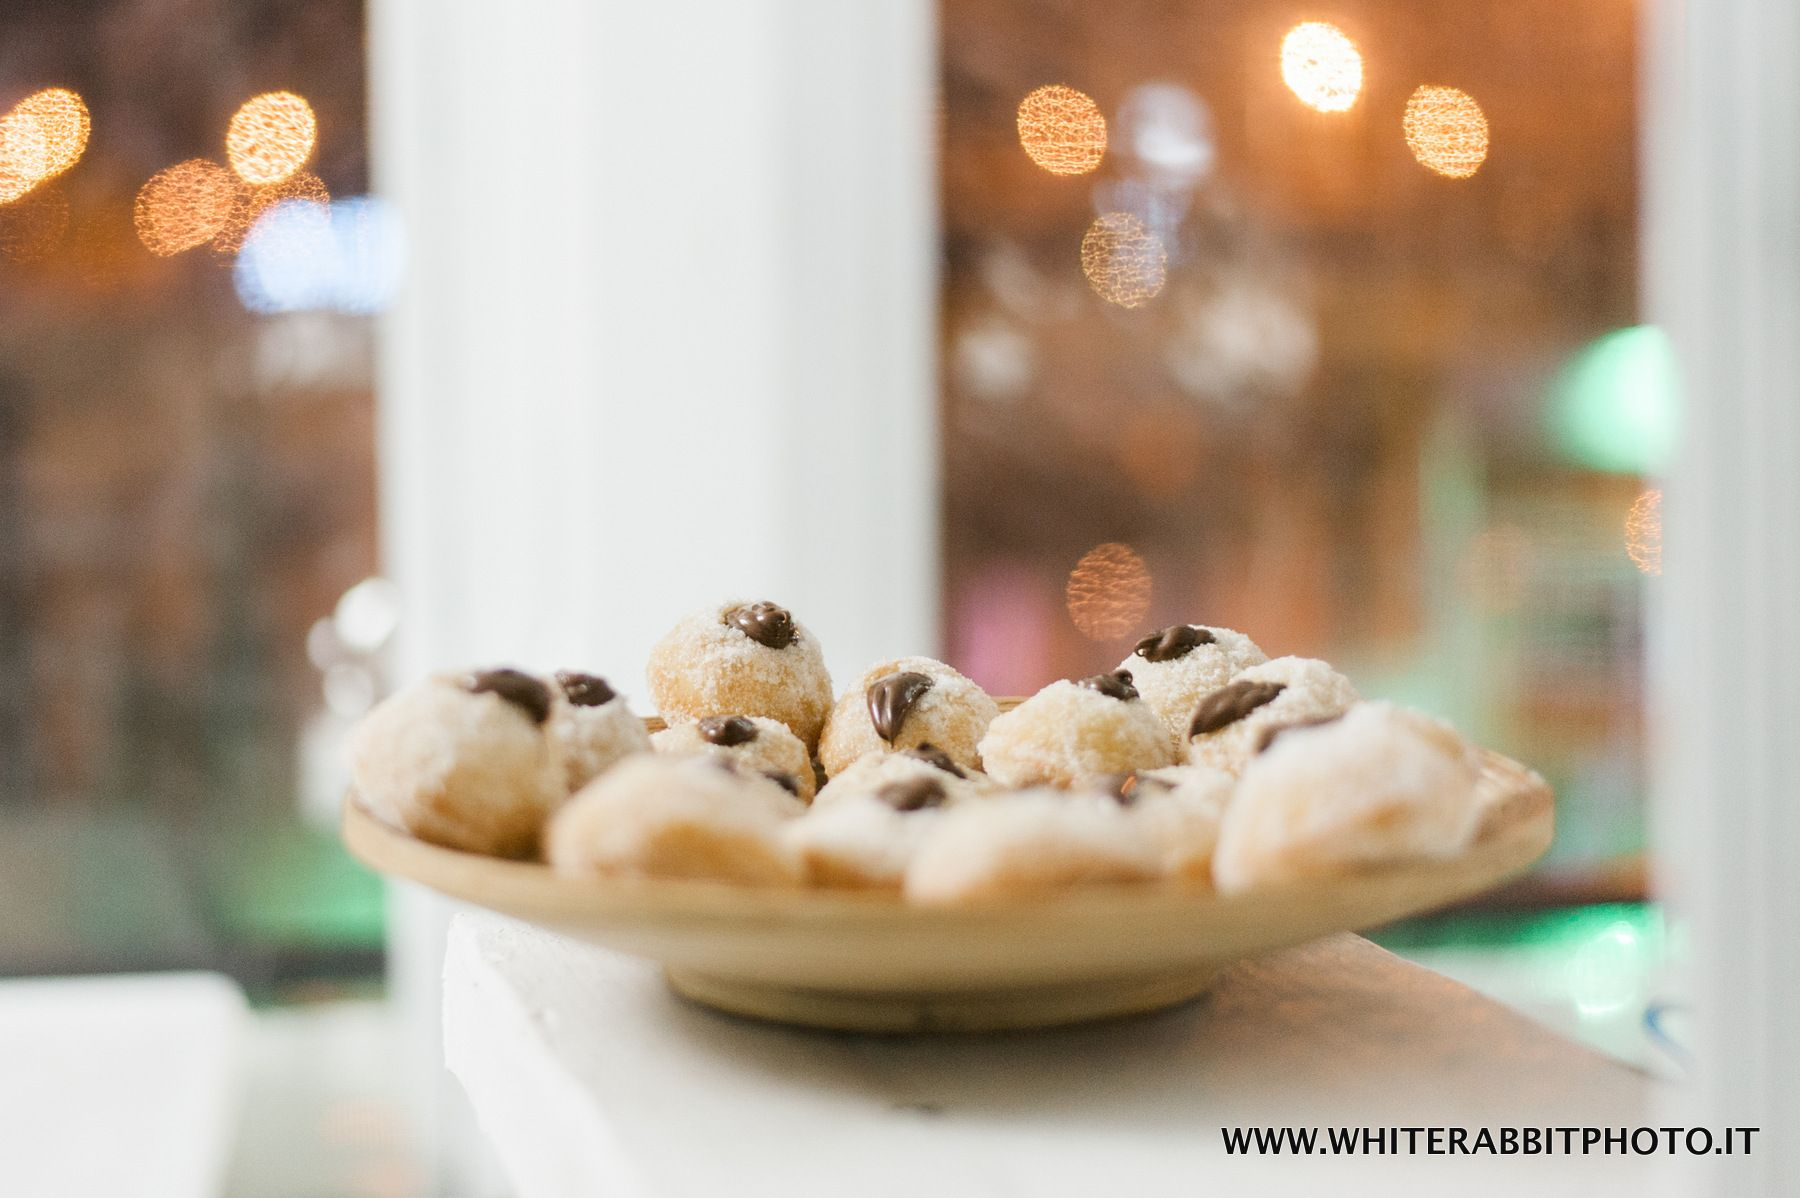 #food #foodphotography www.whiterabbitphoto.it